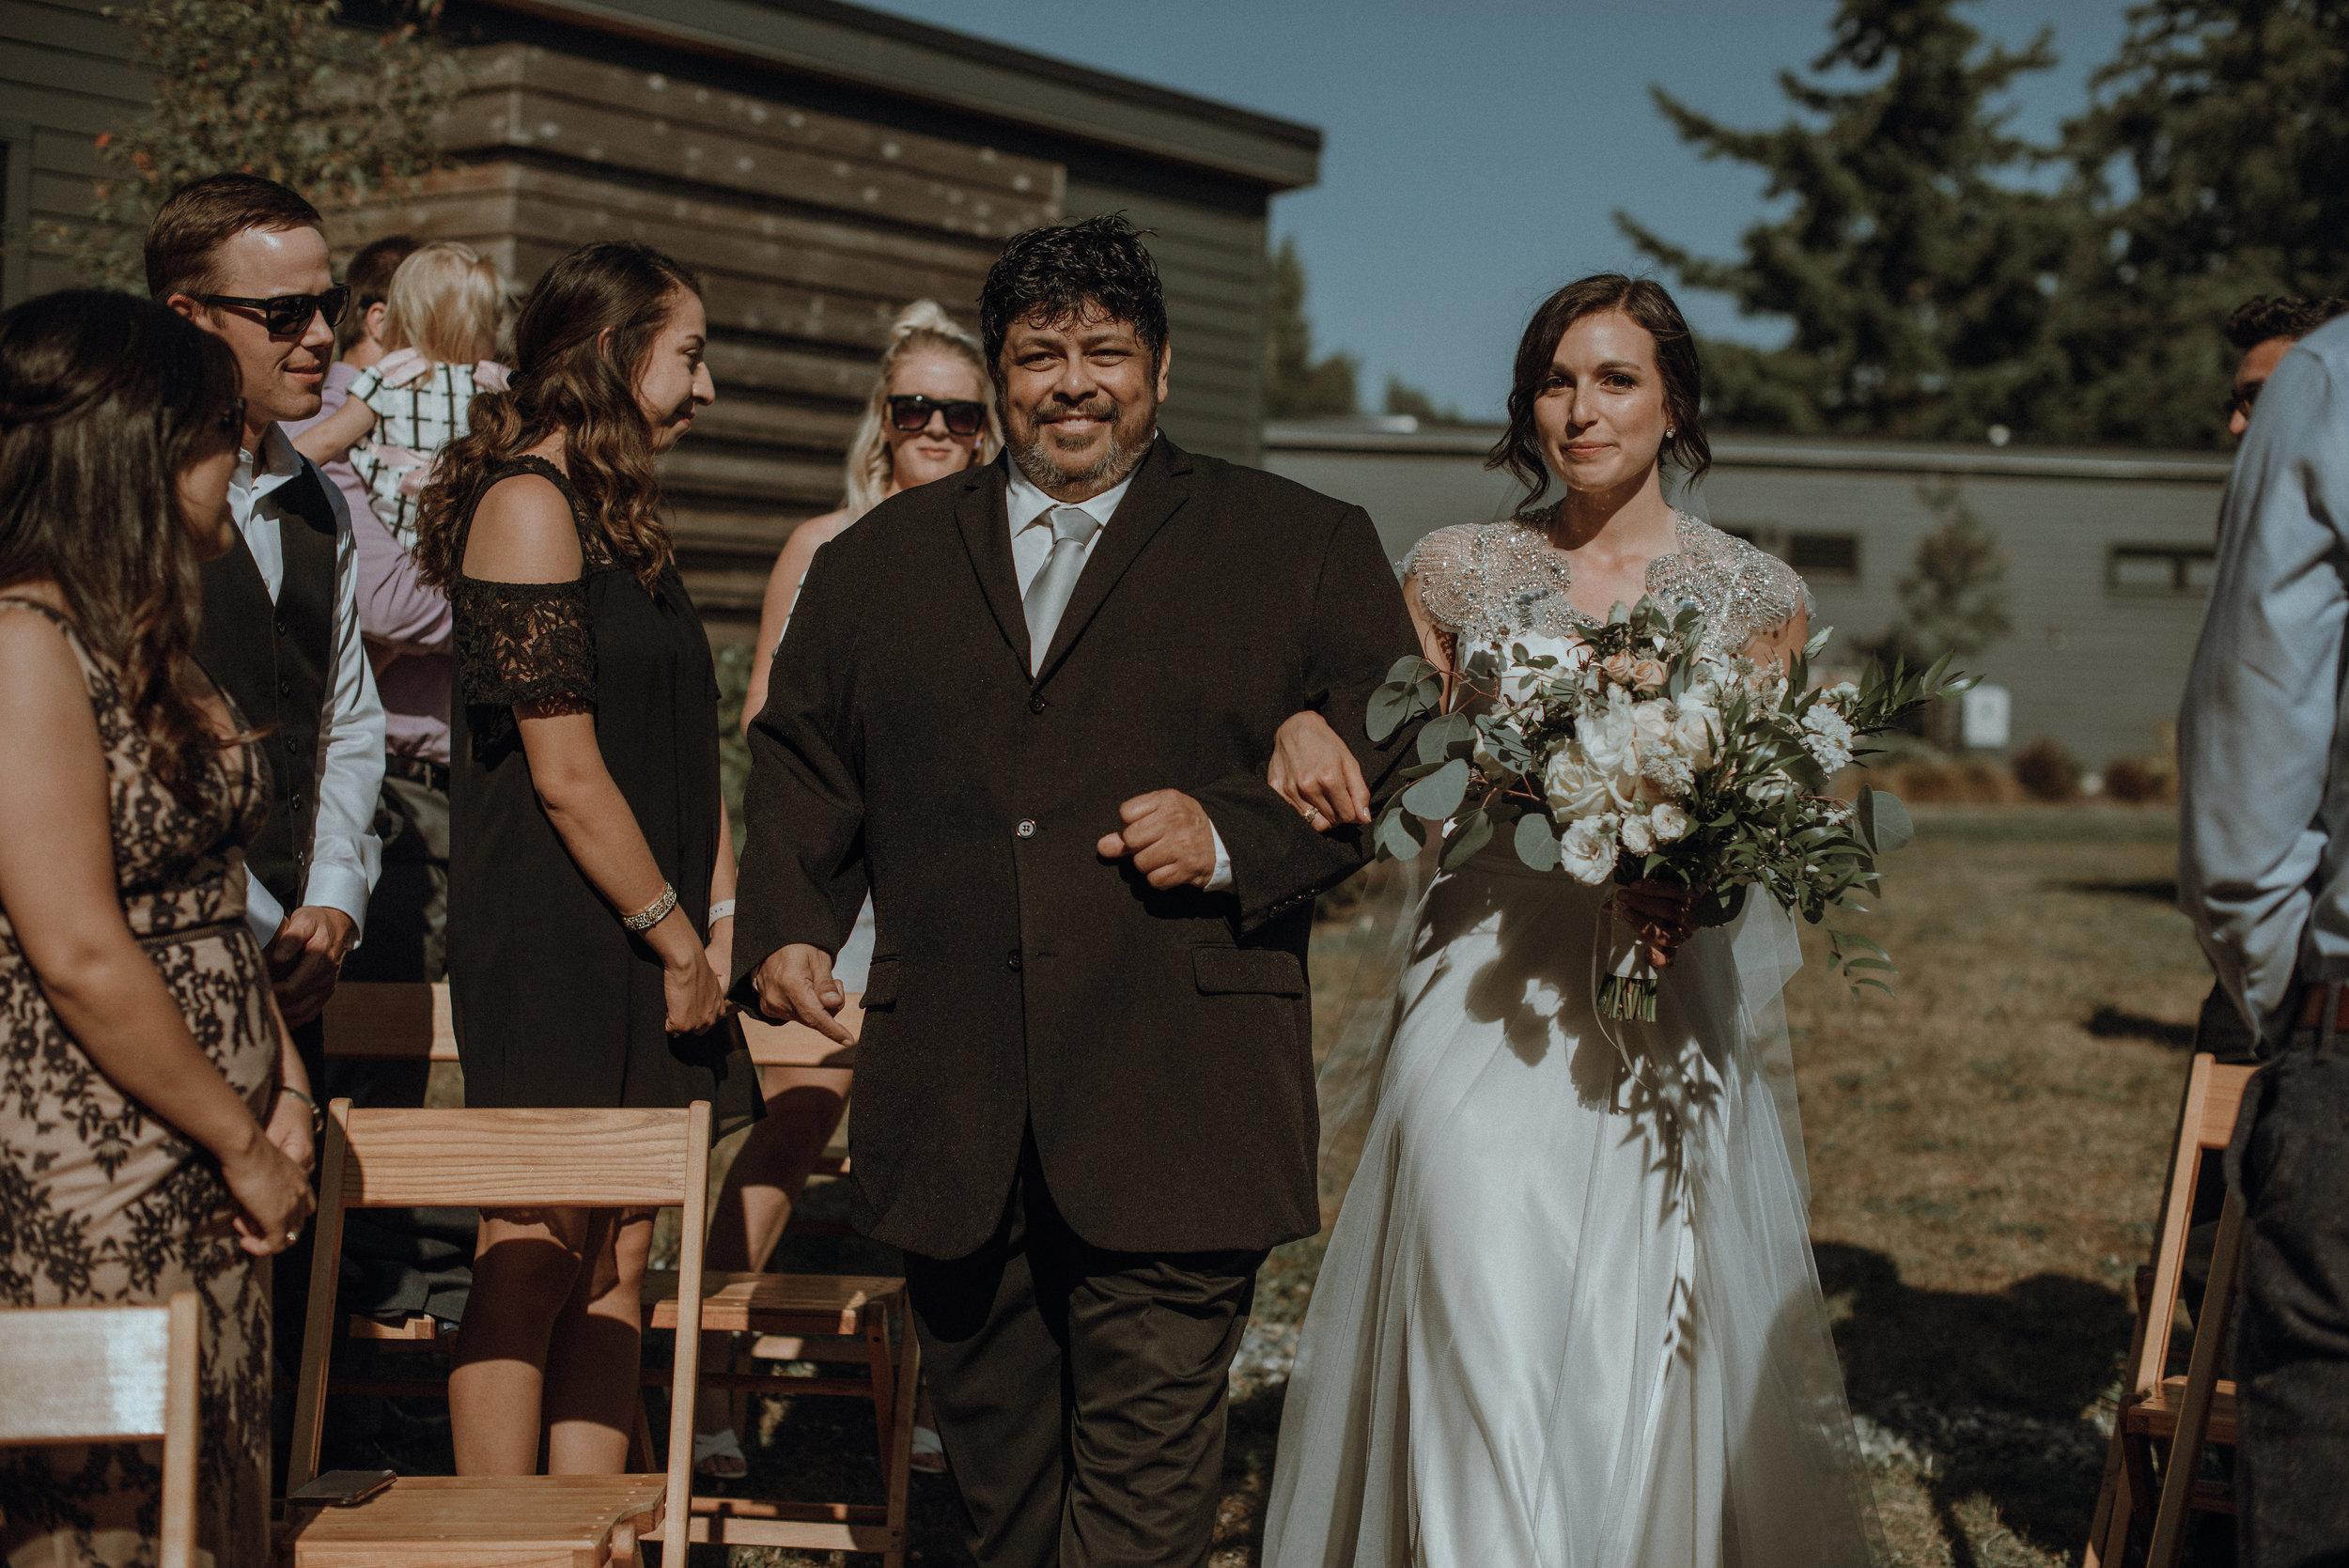 Lodges-at-Vashon-wedding7.jpg